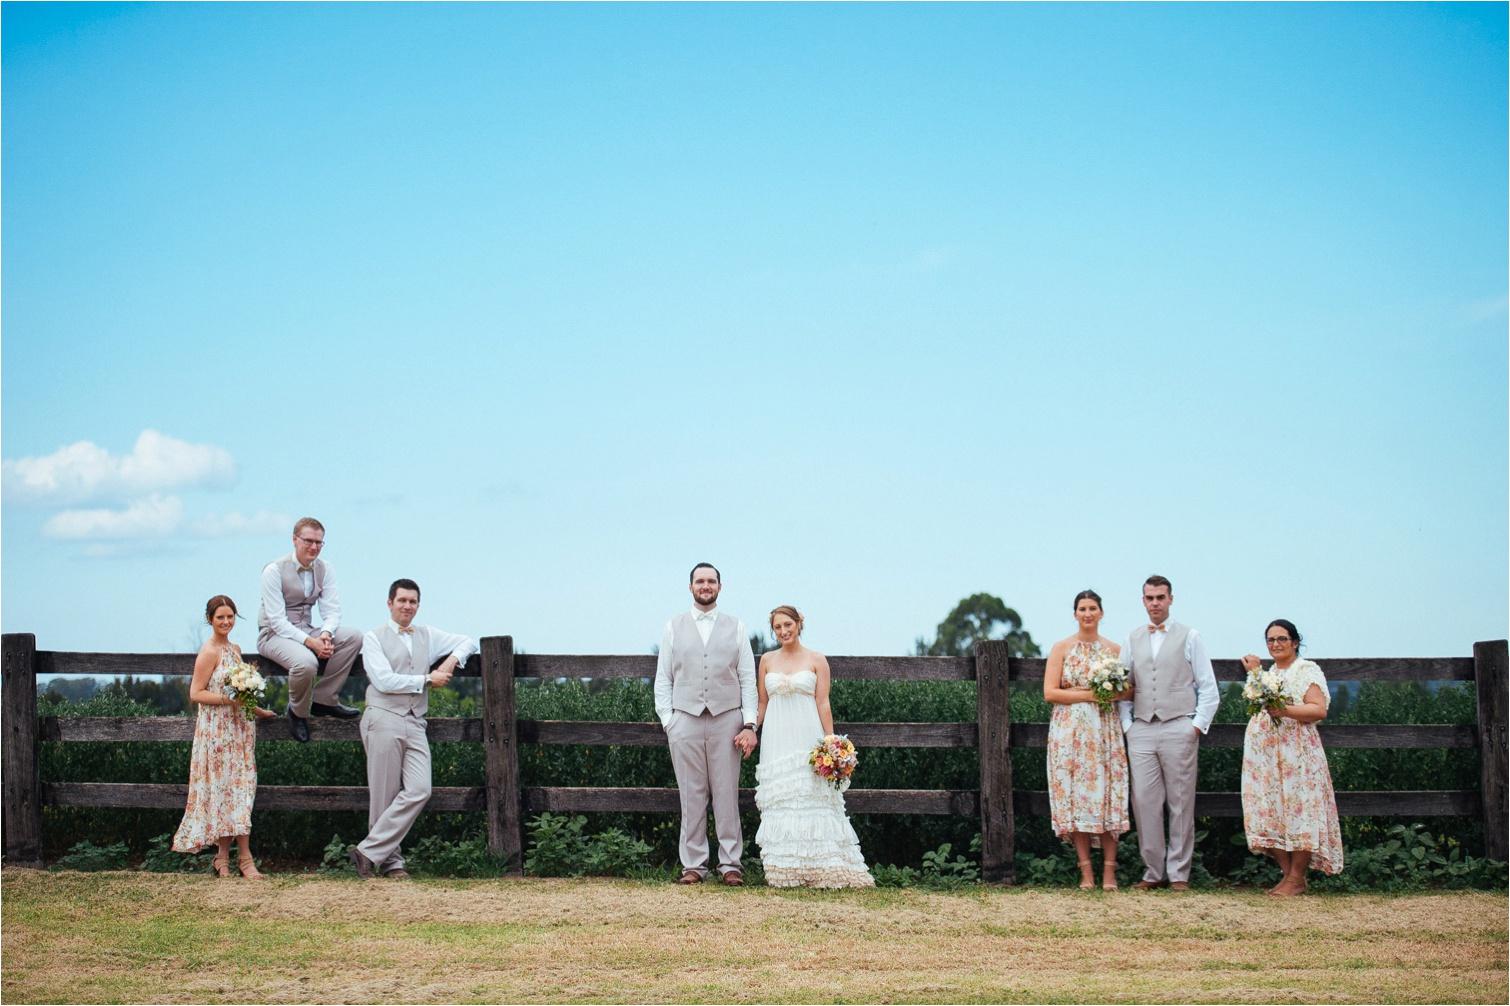 Jenny&Mitch_Sebel_Windsor_Sydney_Polo_Club_wedding-by_The_Follans_Gold_Coast_Wedding_Photographers_0059.jpg